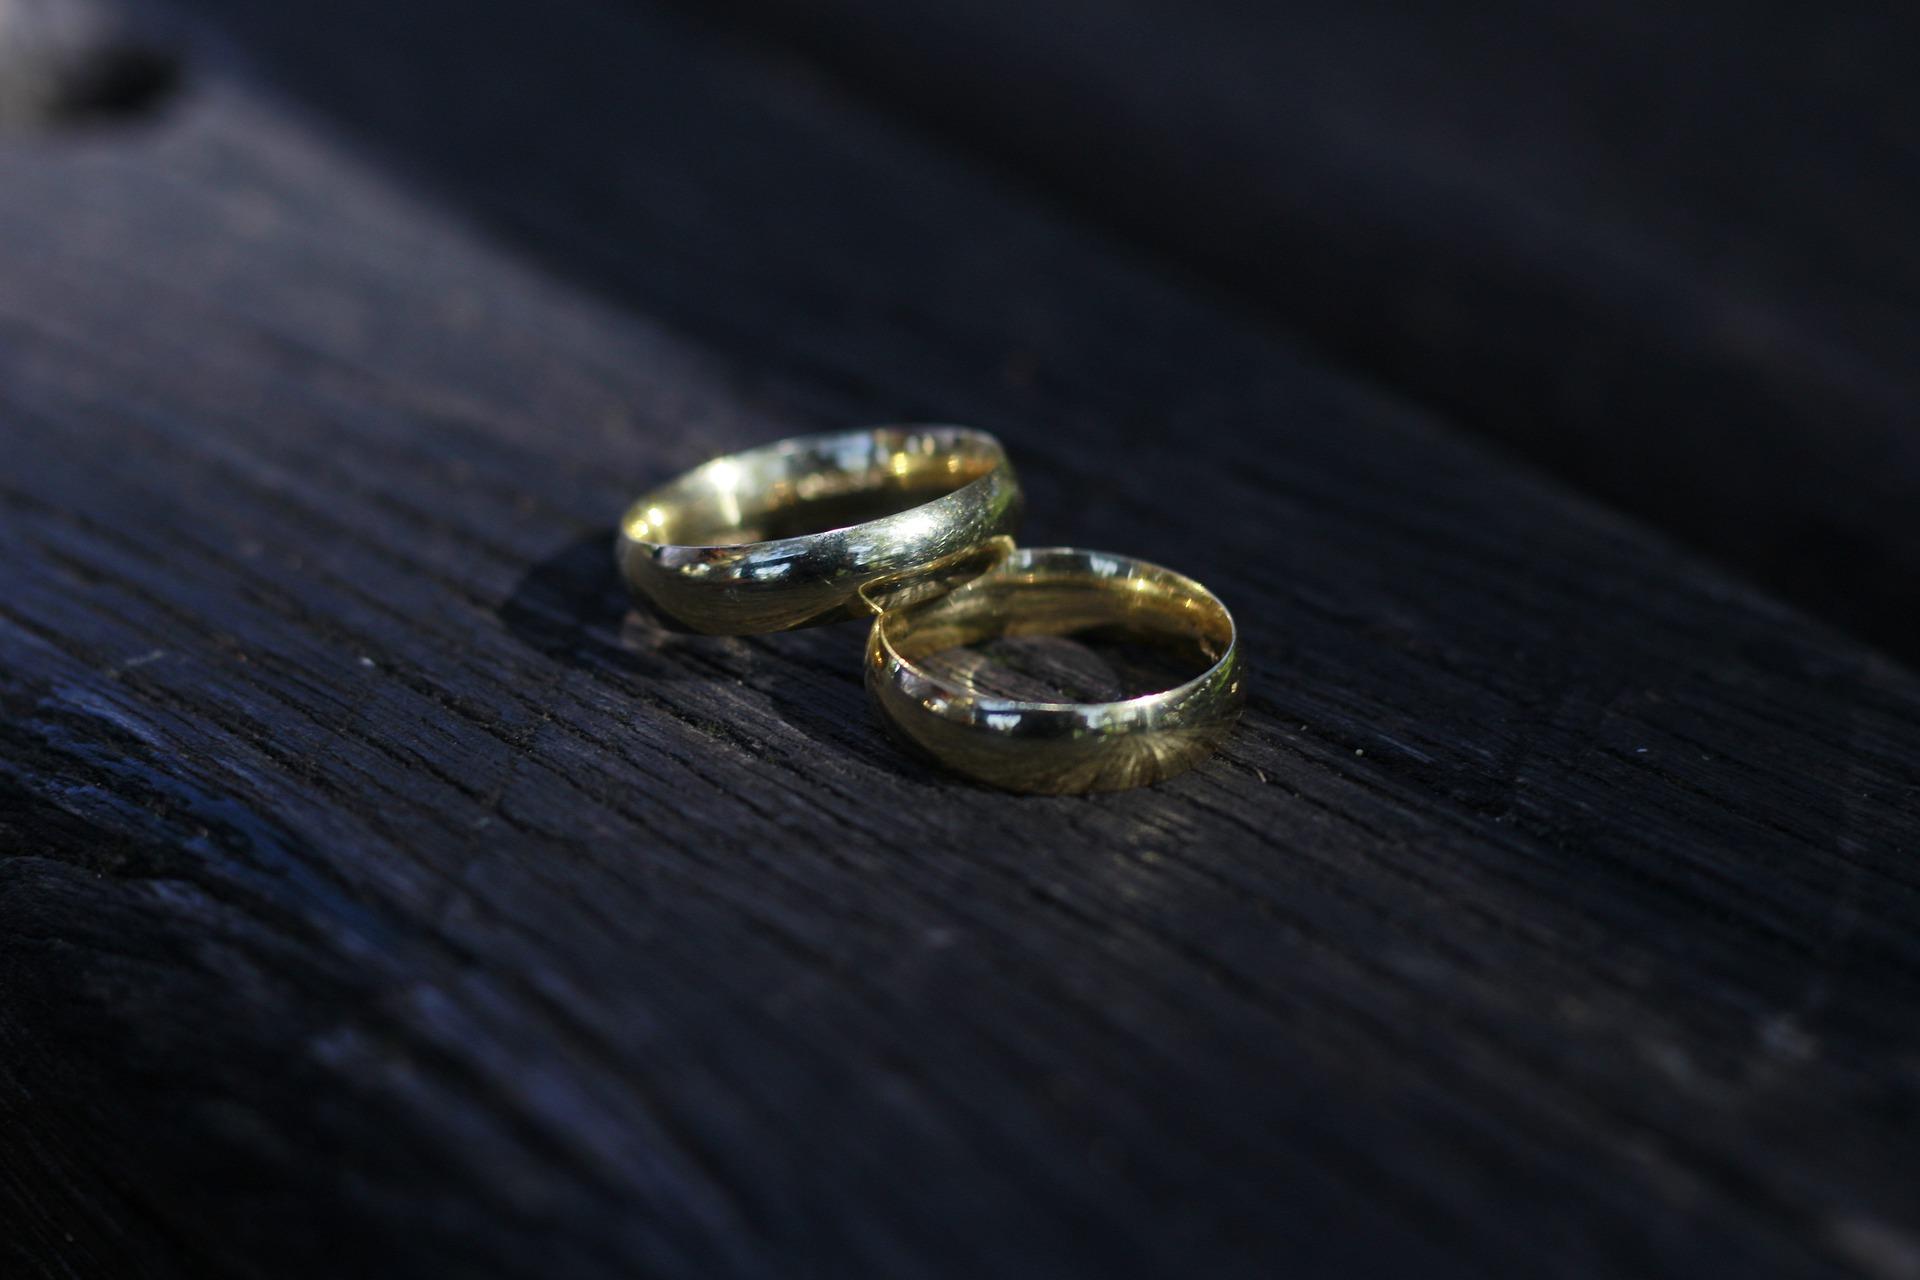 abogado especialista en divorcios express